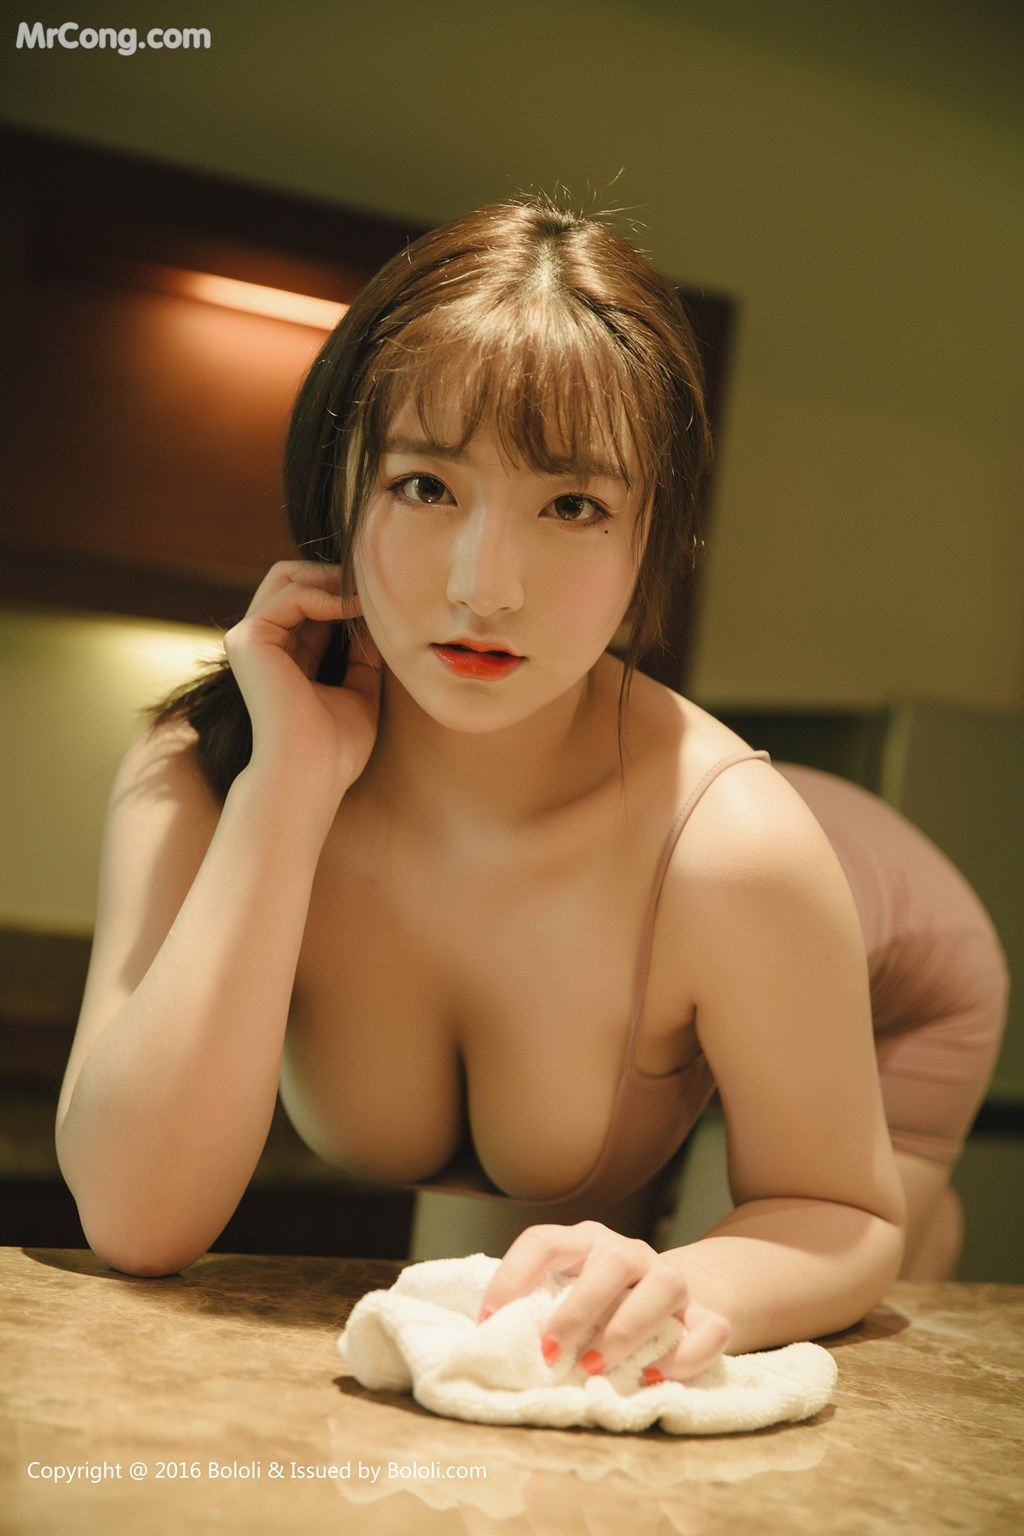 Image Tukmo-Vol.114-Mang-Guo-milk-MrCong.com-005 in post Tukmo Vol.114: Người mẫu Mang Guo (芒果milk) (40 ảnh)